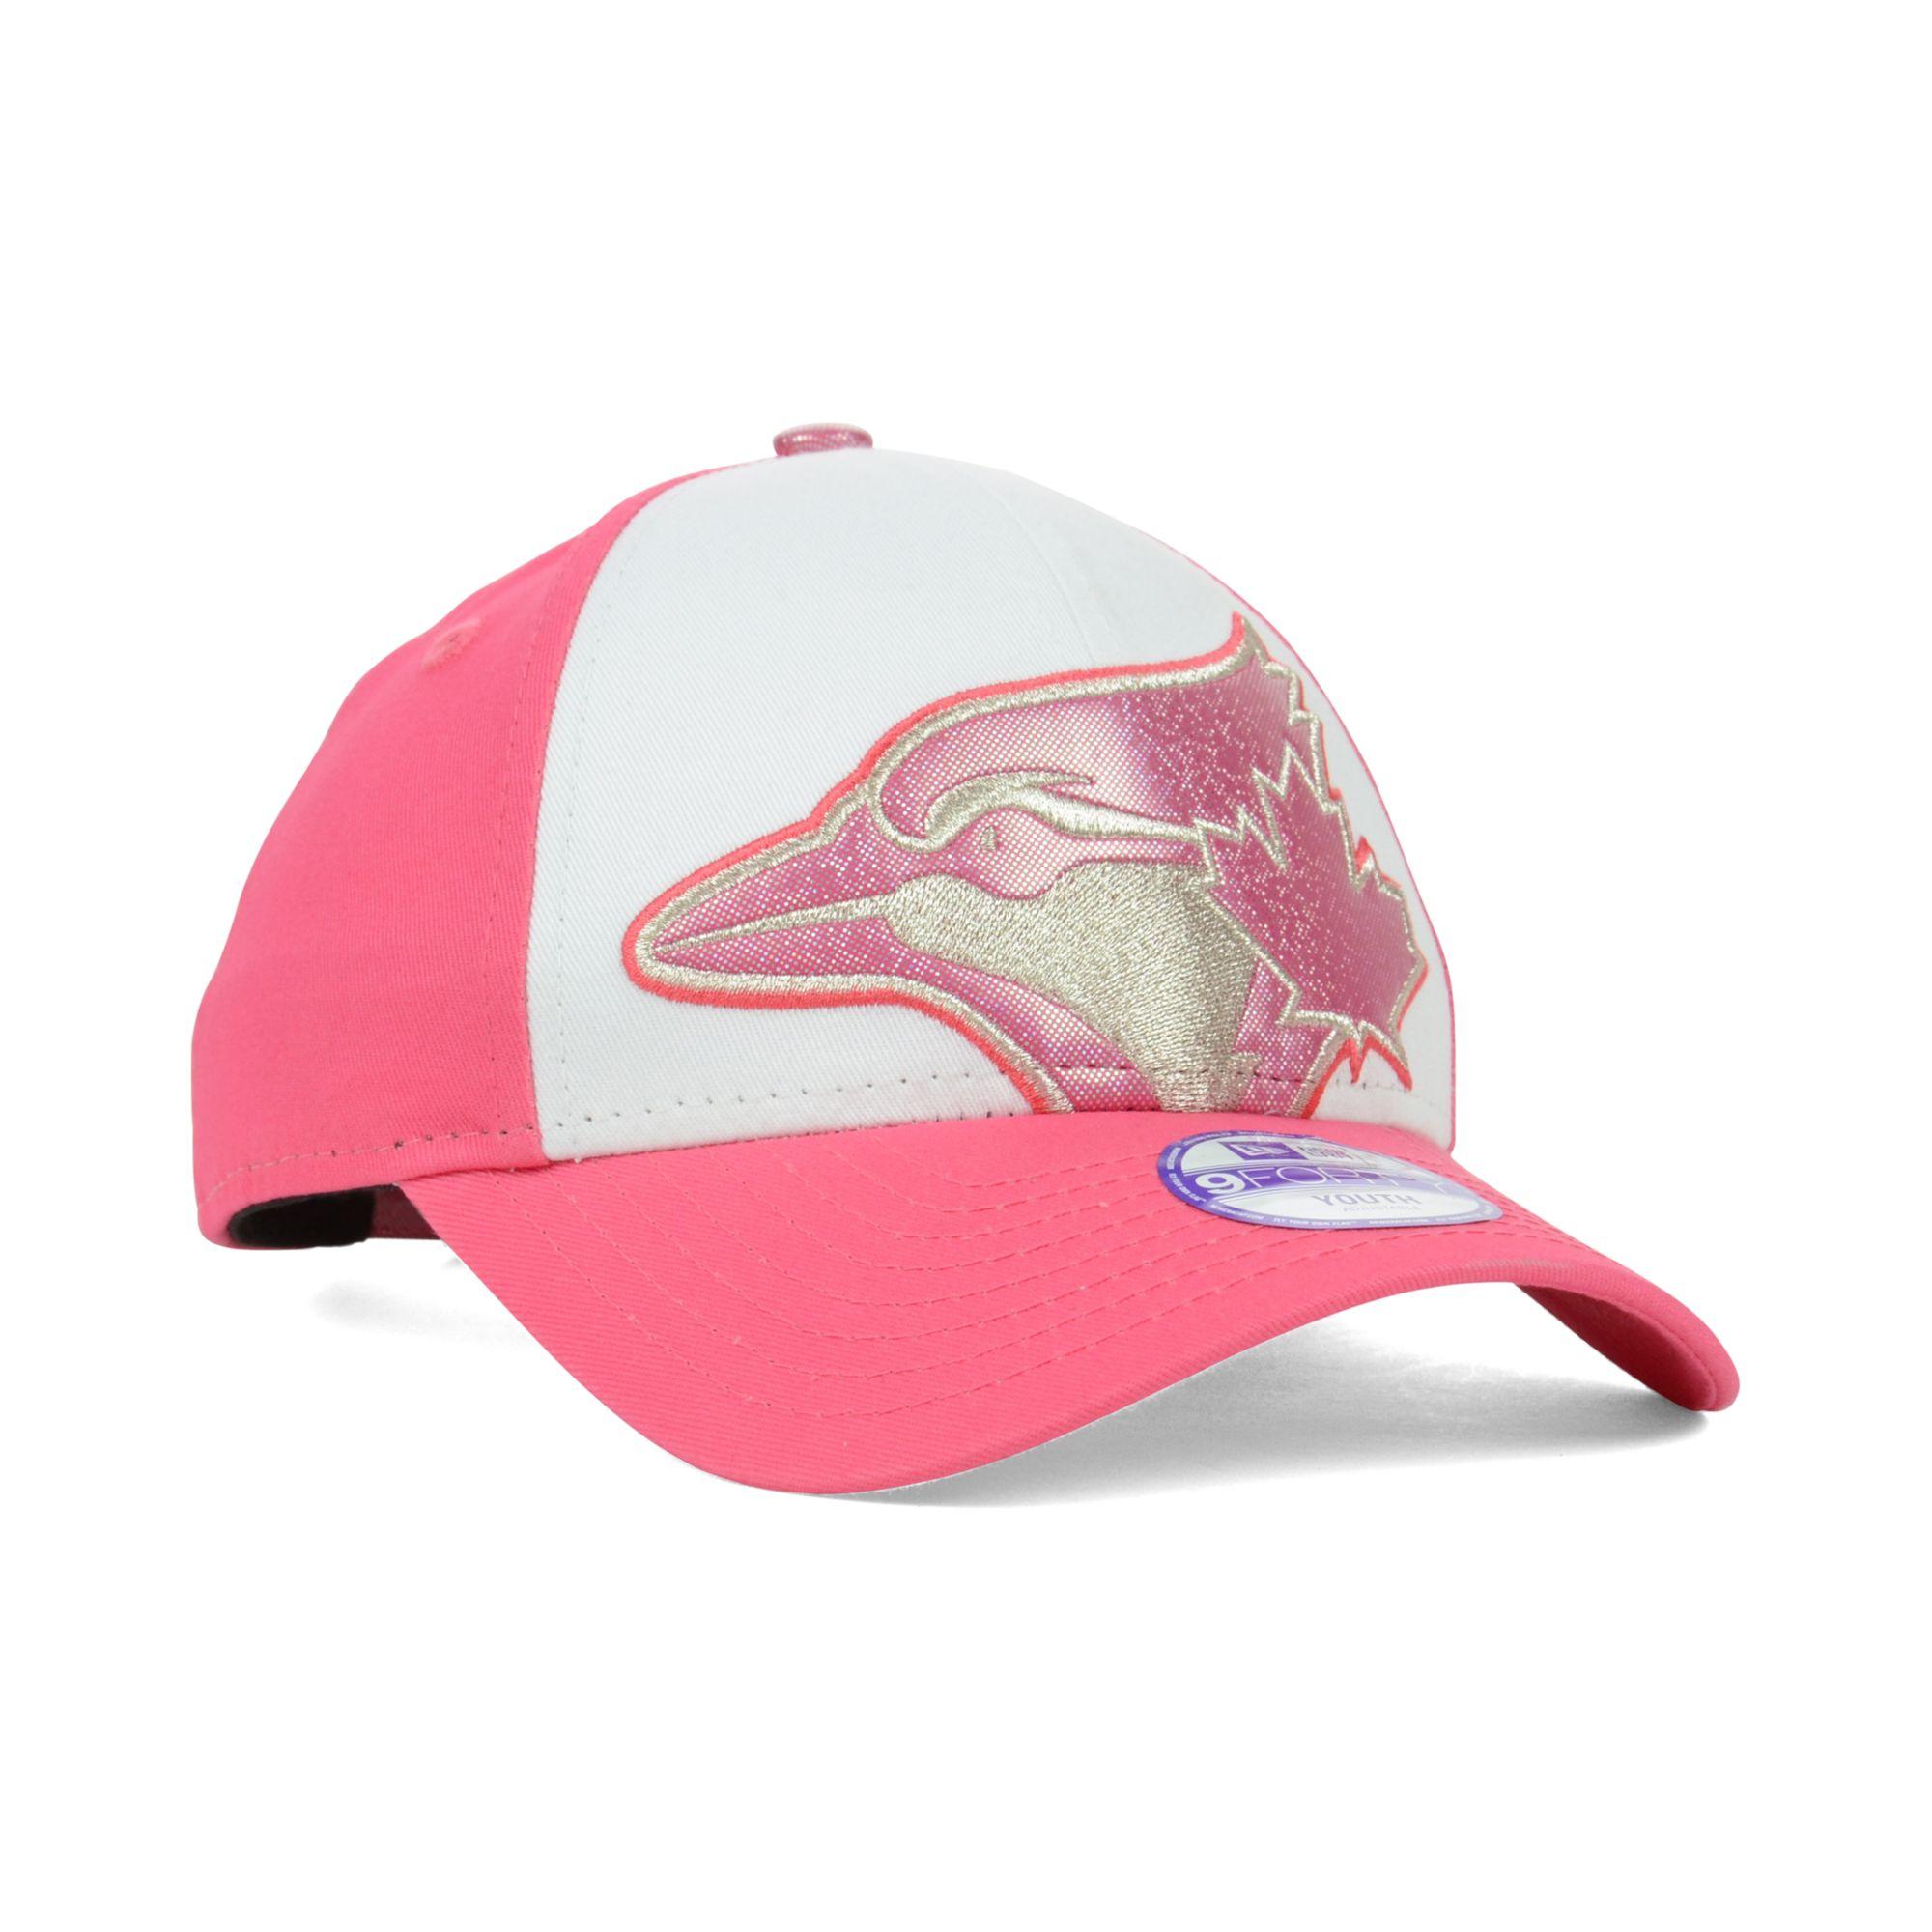 363c16e99f3 ... new zealand lyst ktz kids toronto blue jays glitter filler 9forty cap  in pink 88b4d 22289